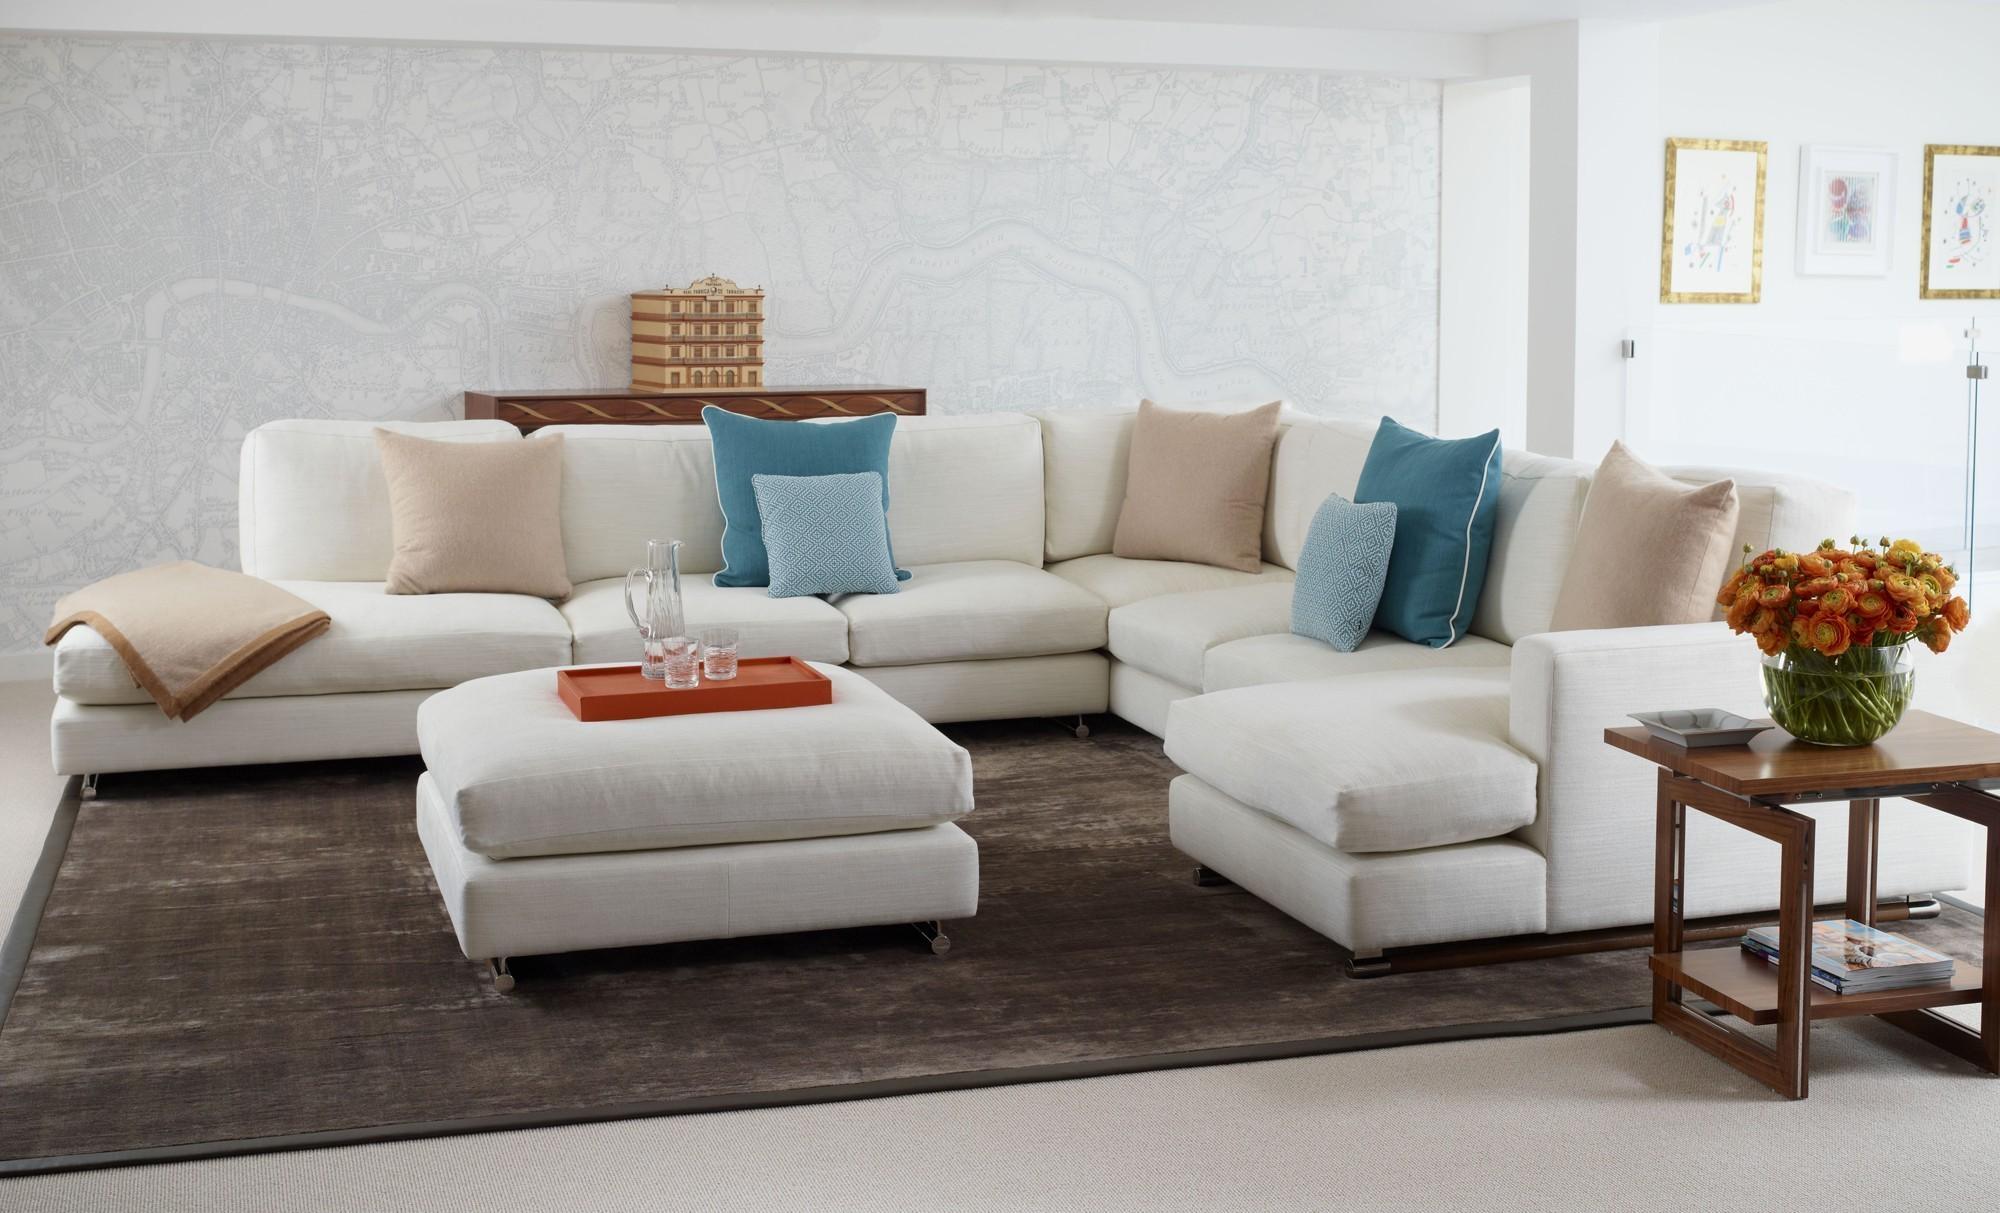 Ideal Modular Sectional Sofa Decor   Home Designjohn Within Small Modular Sectional Sofa (Image 9 of 20)